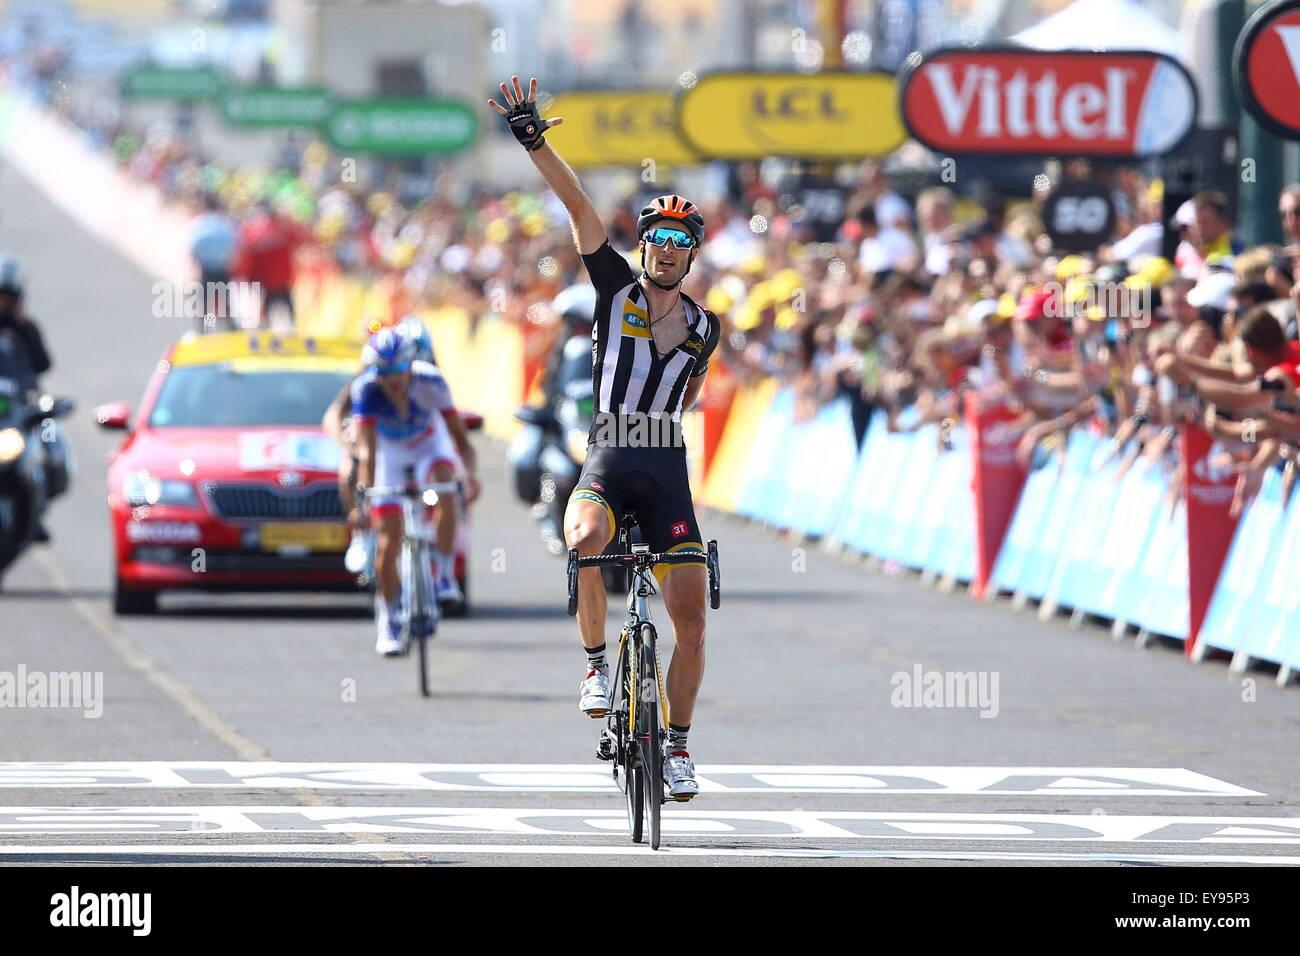 Victoire Stephen Cummings - MTN Qhubeka - 18 07 2015 - Tour